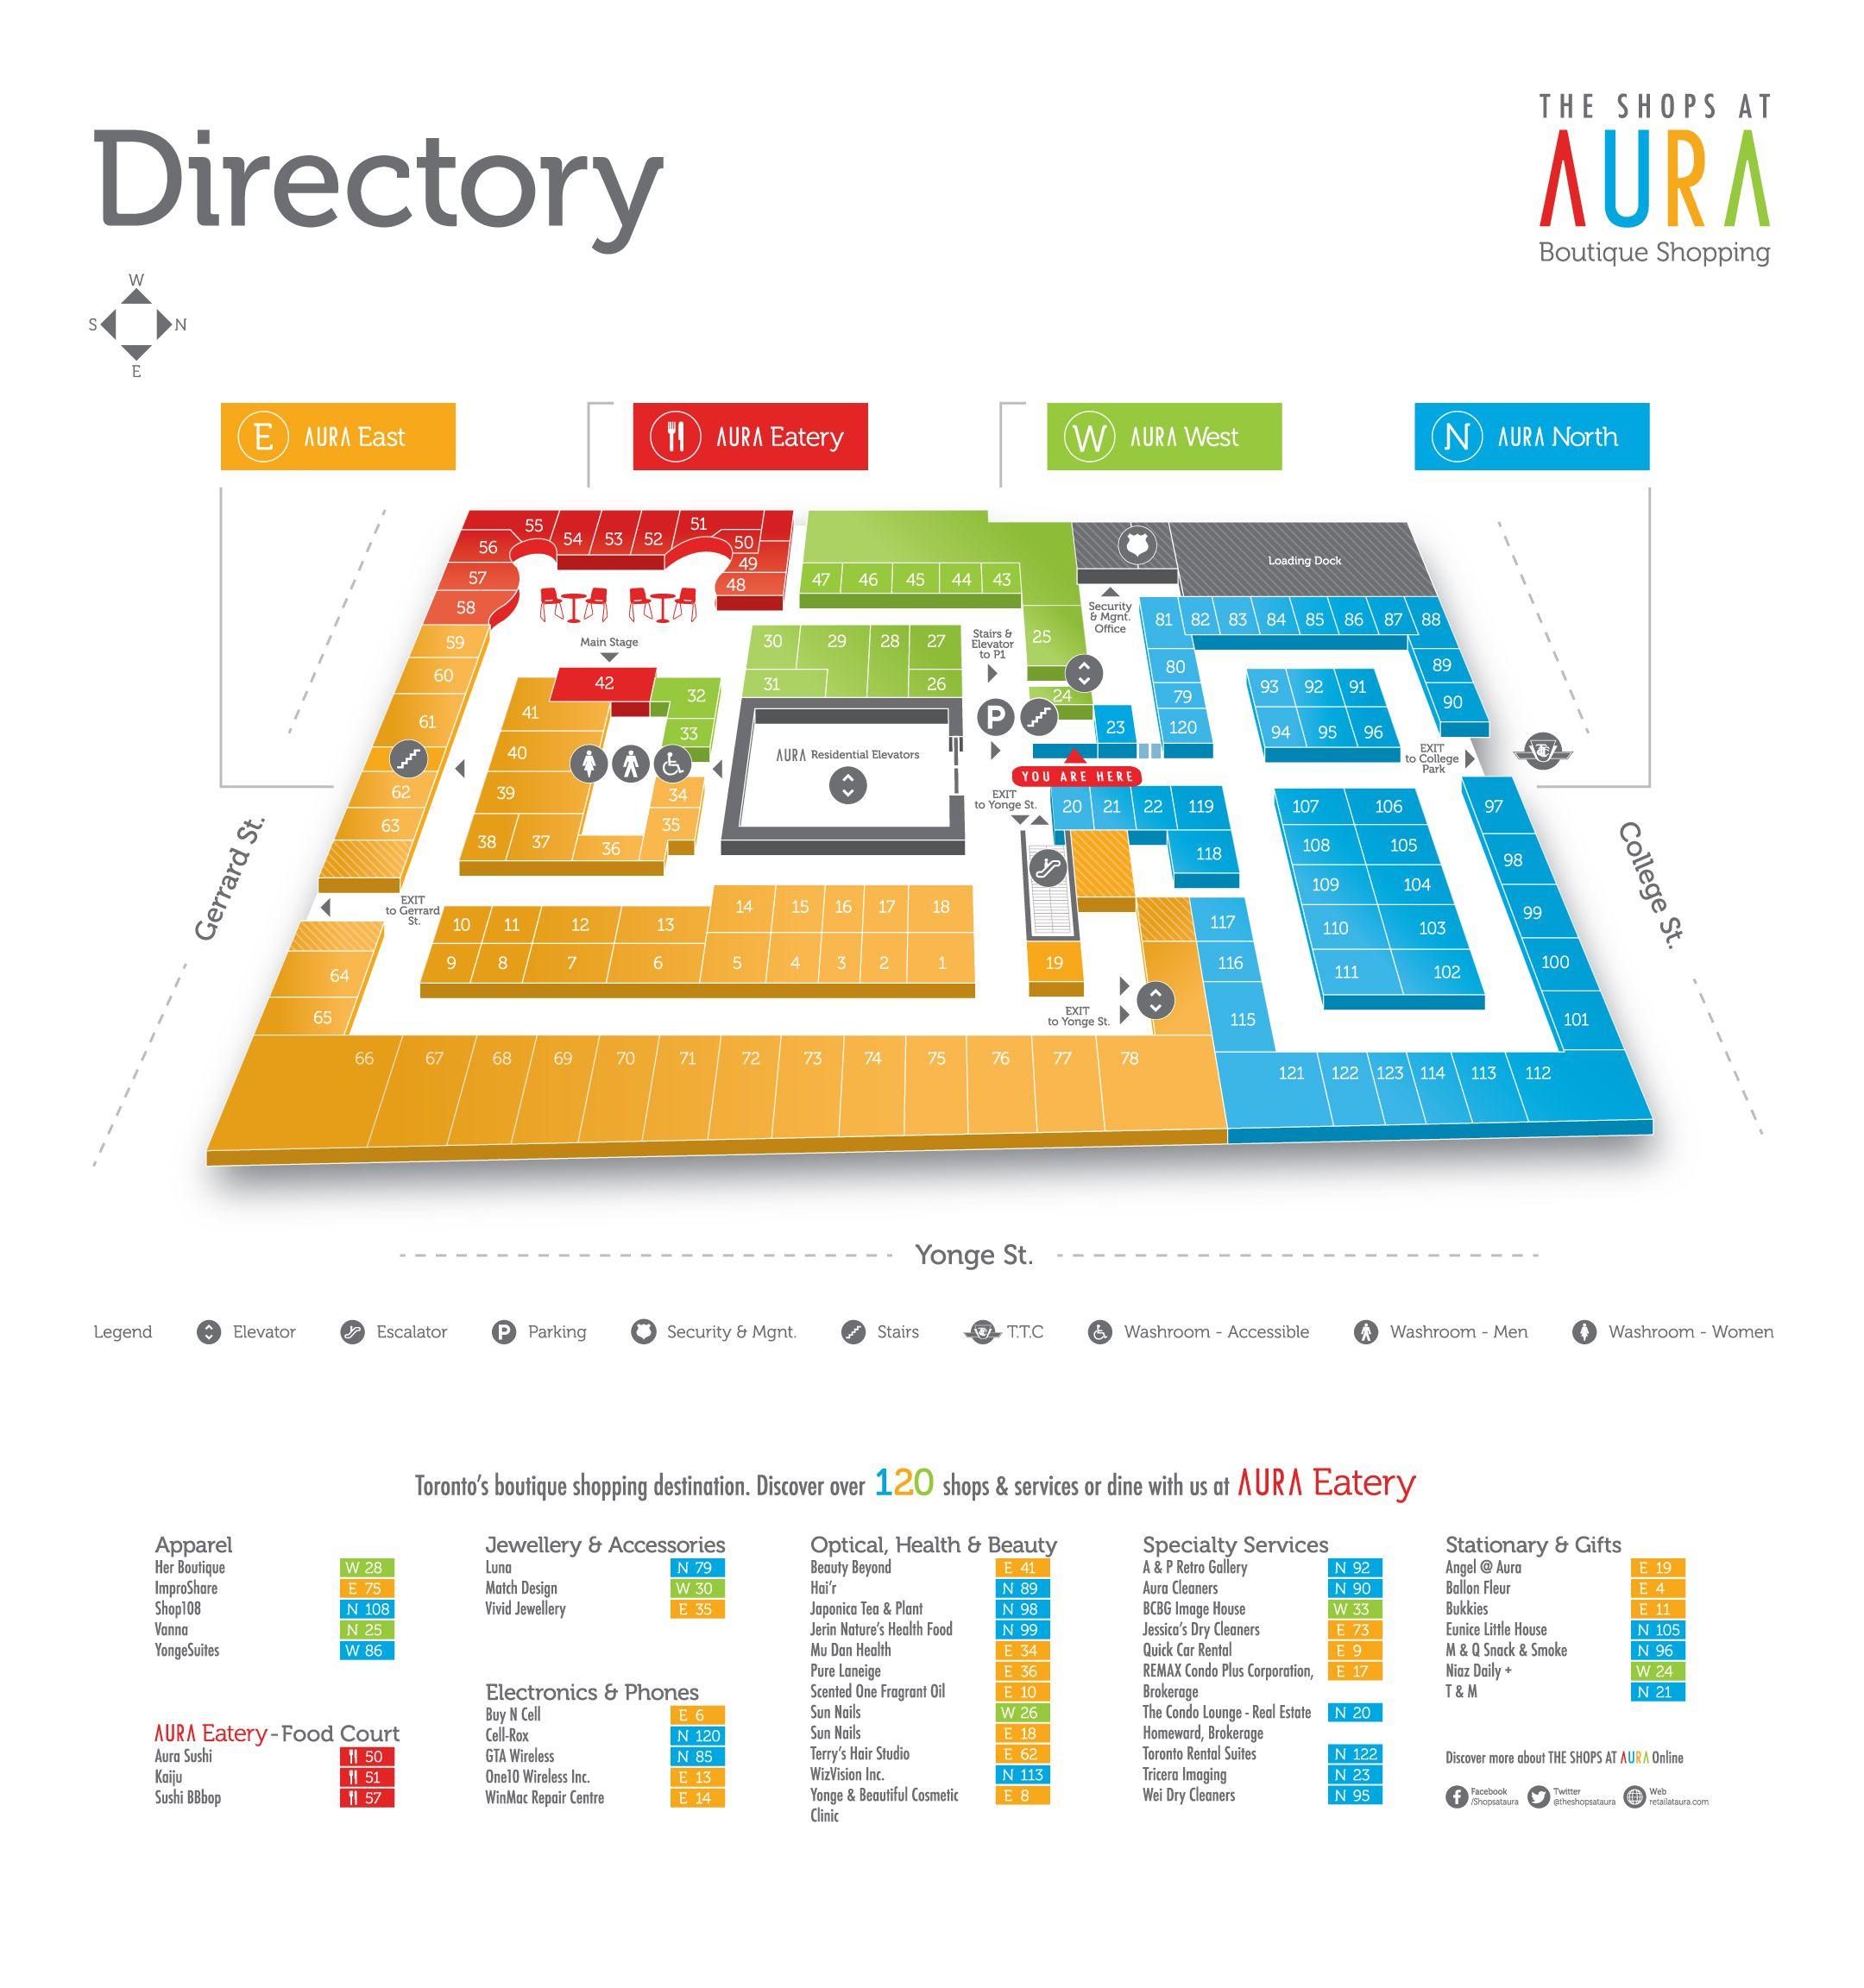 Our Map Illustration For The Shops At Aura Signage Design Map Signage Map Design